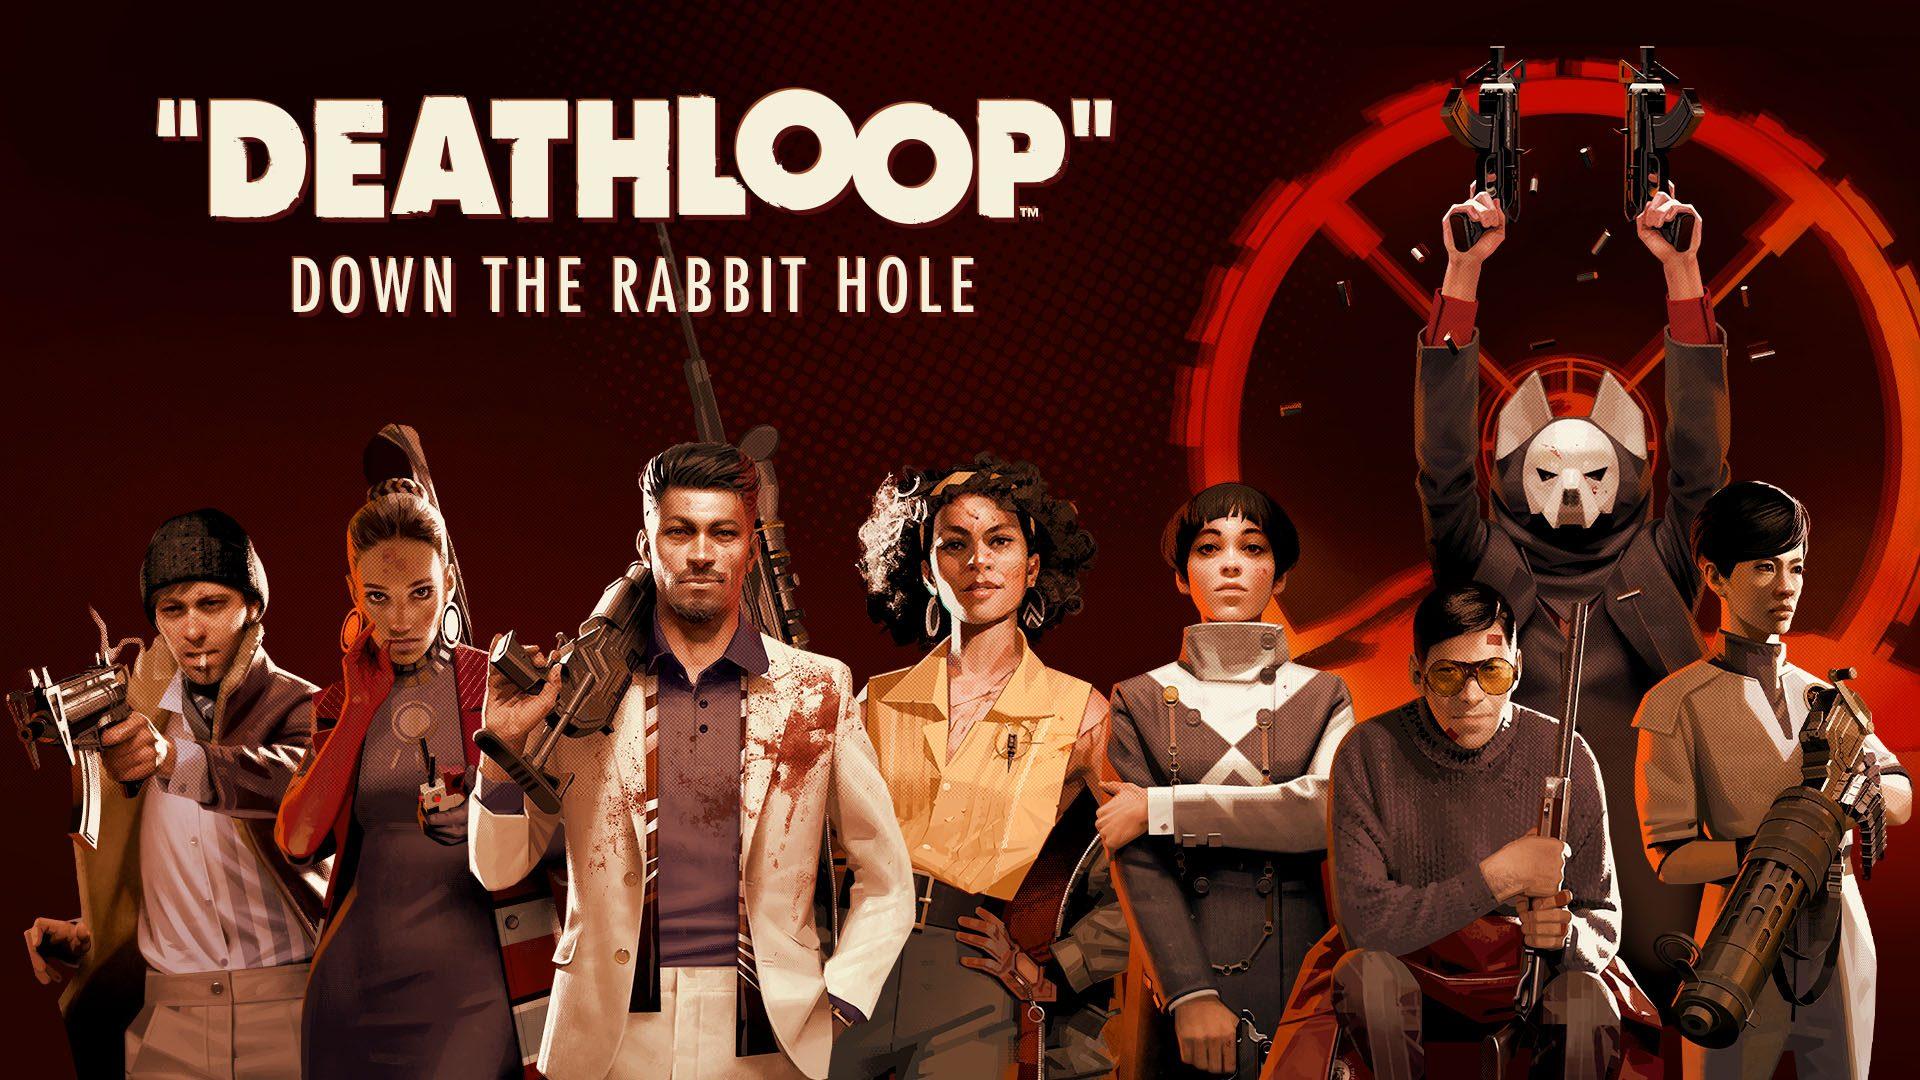 New DEATHLOOP Trailer Revealed At PlayStation Showcase